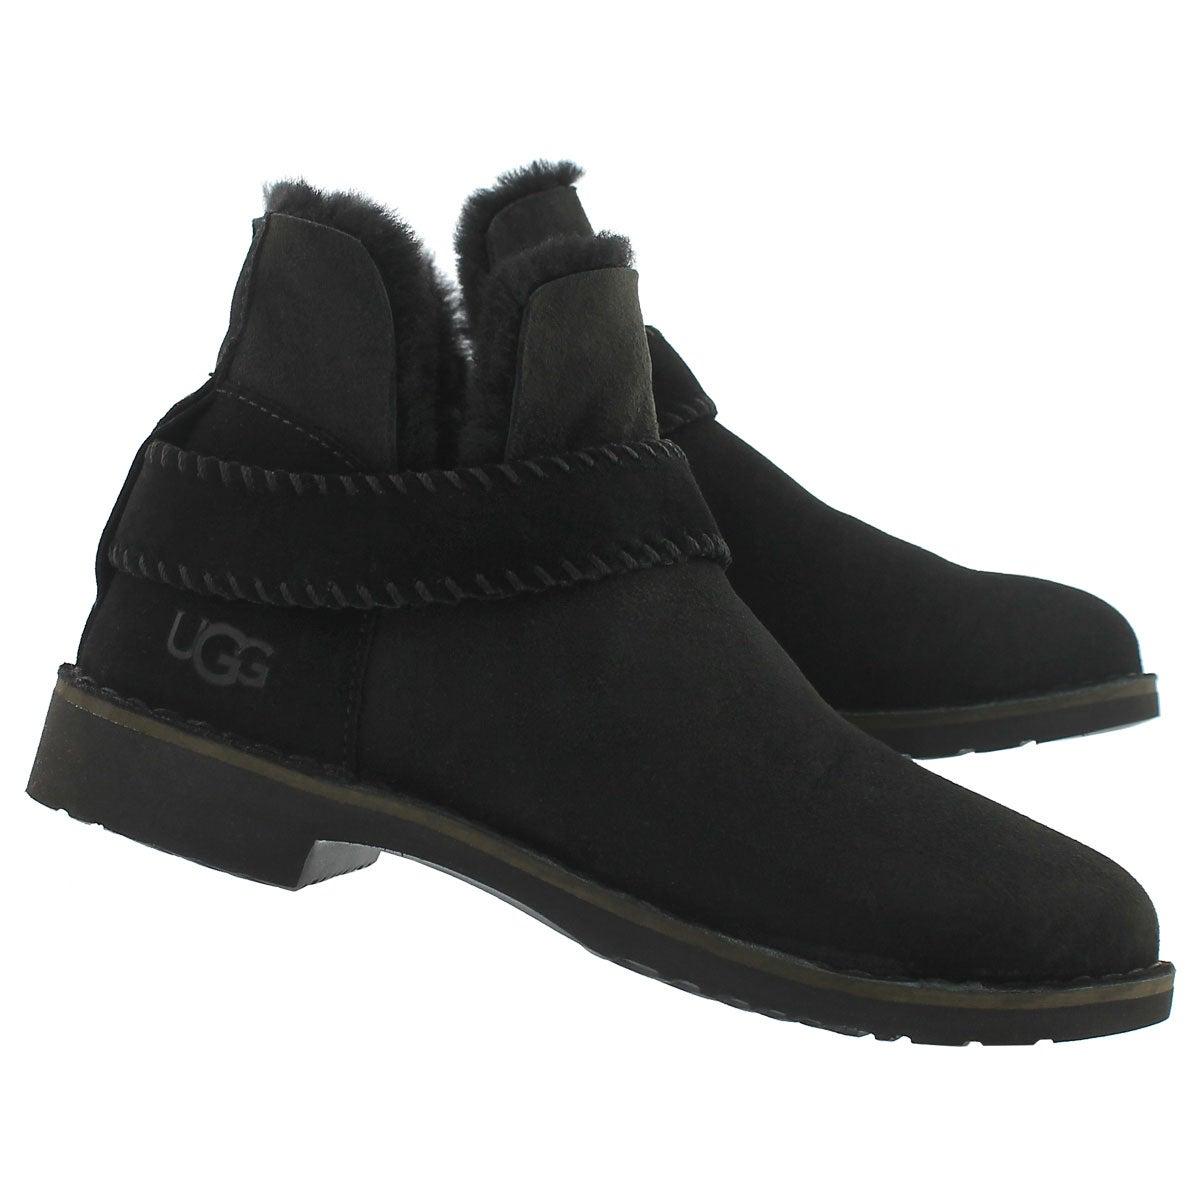 Lds McKay black sheepskin bootie